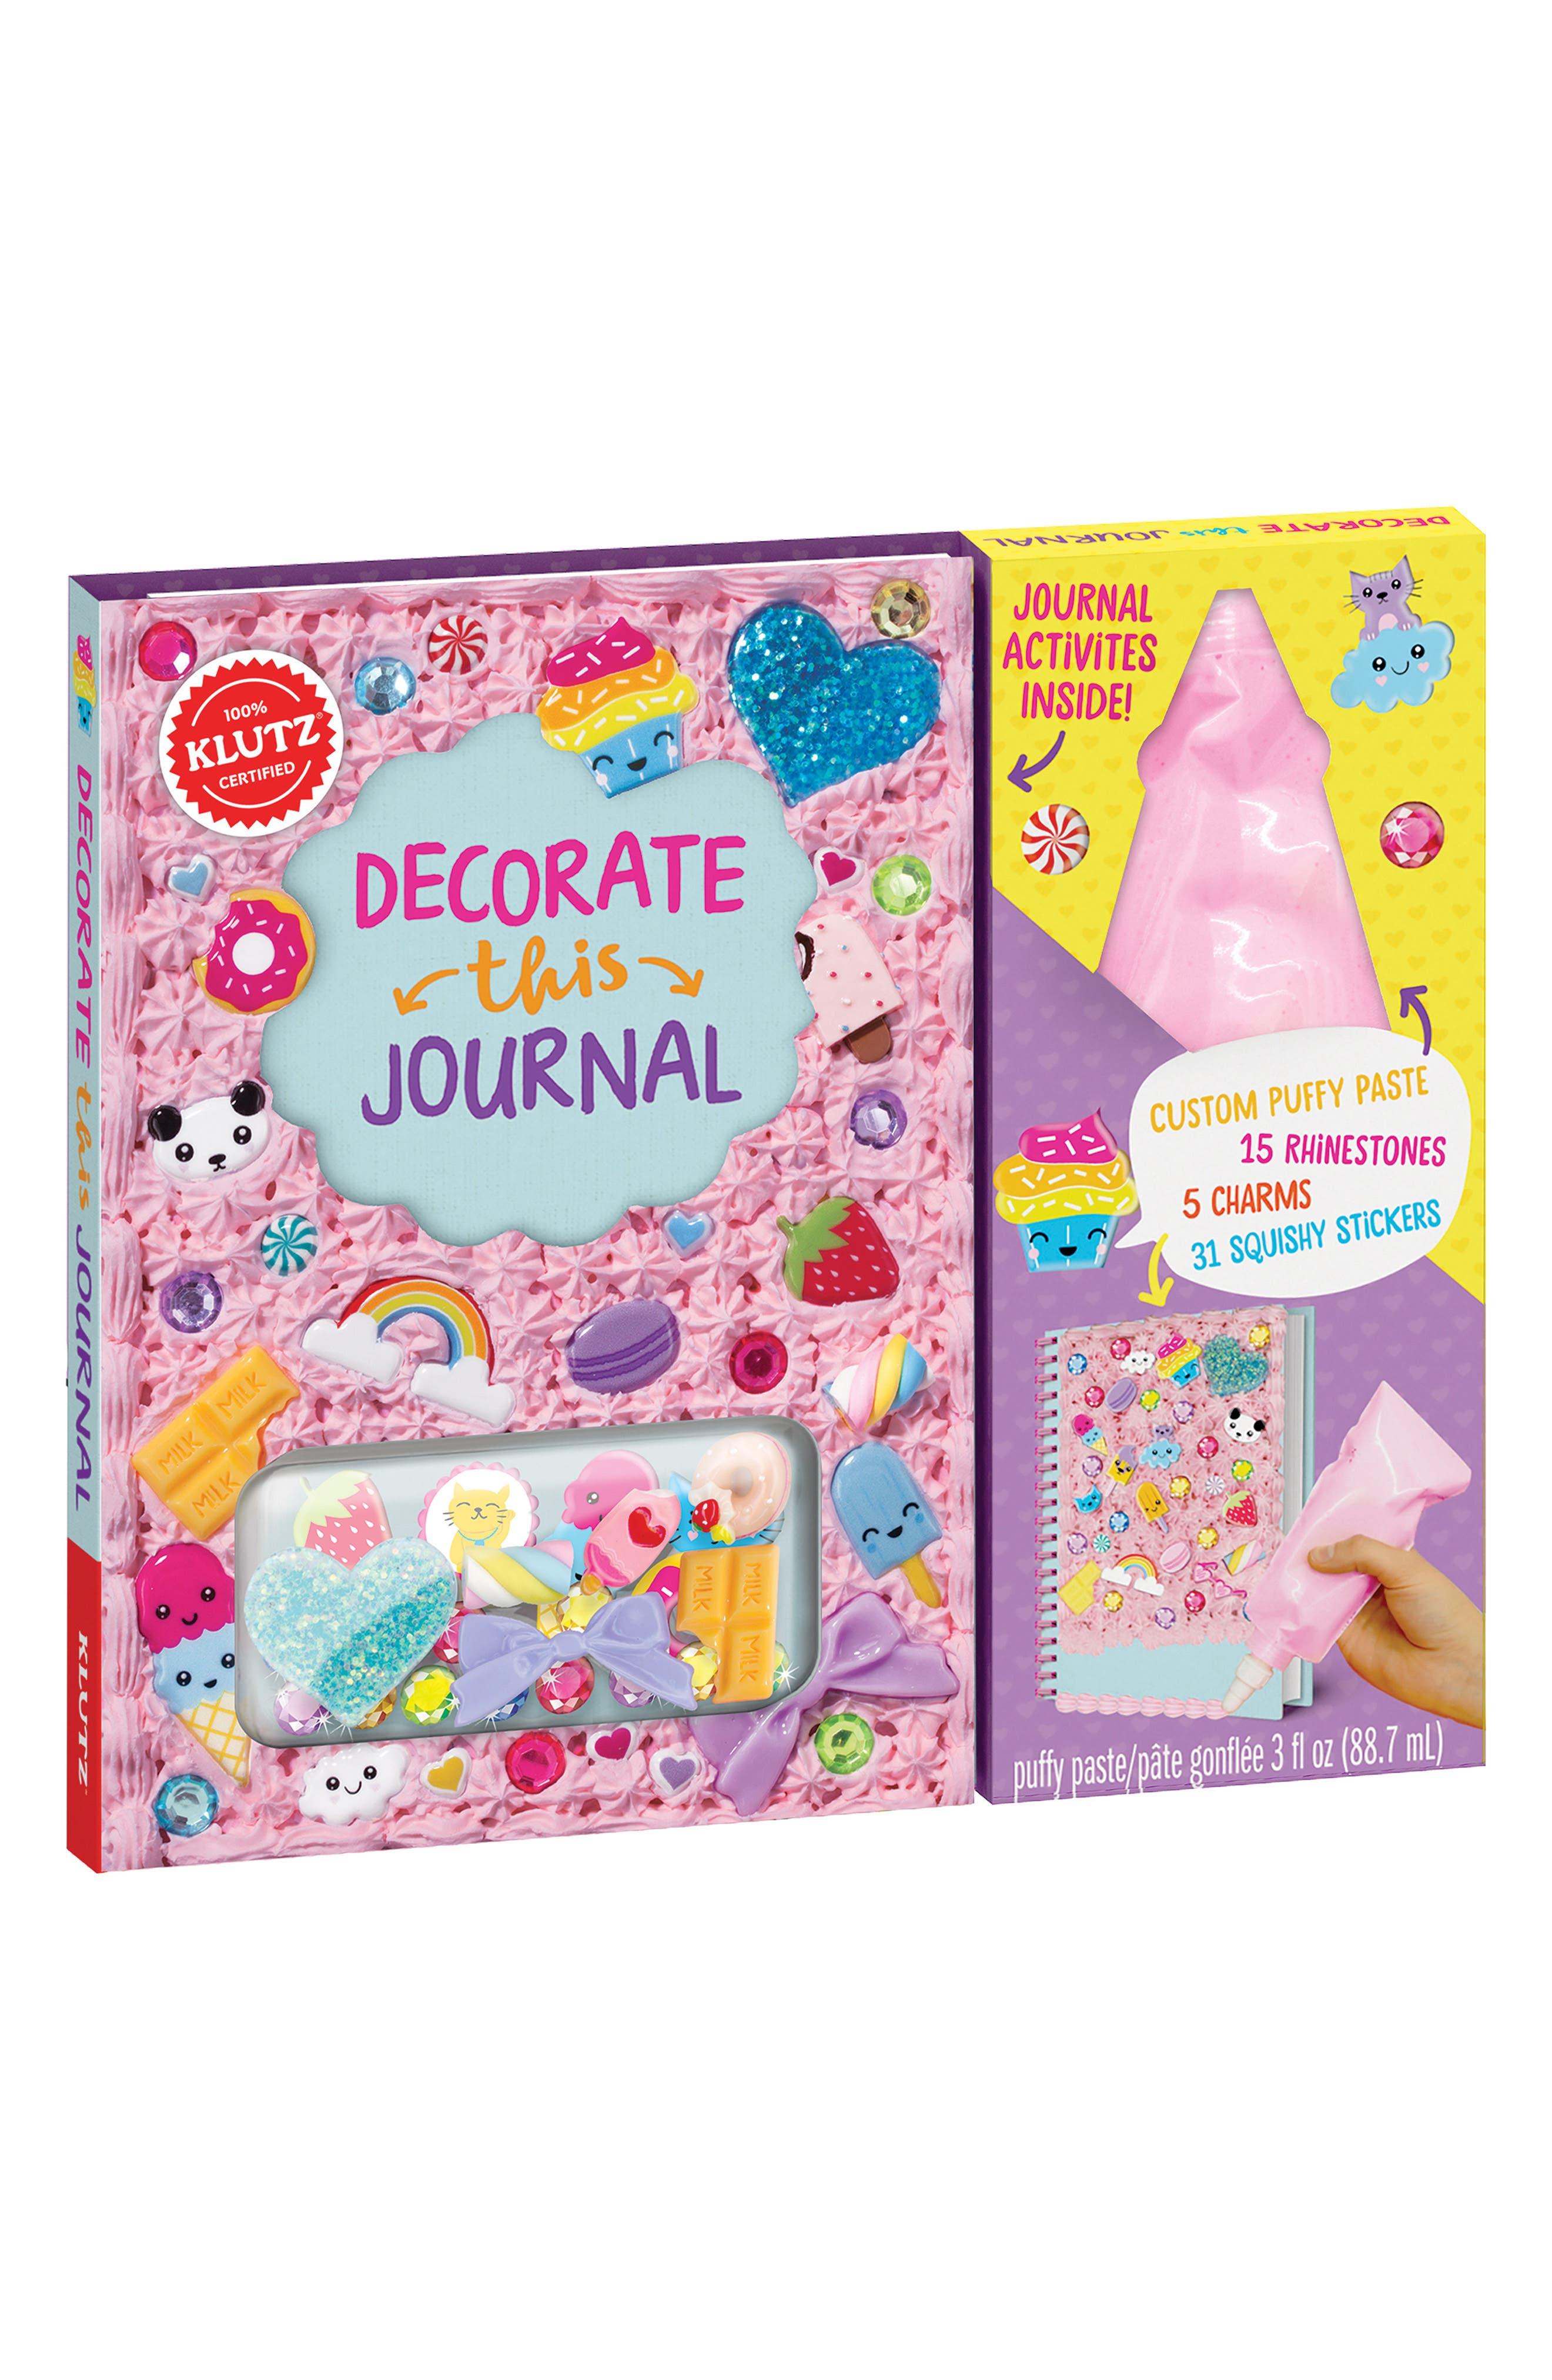 Klutz Decorate This Journal Activity & Journaling Kit